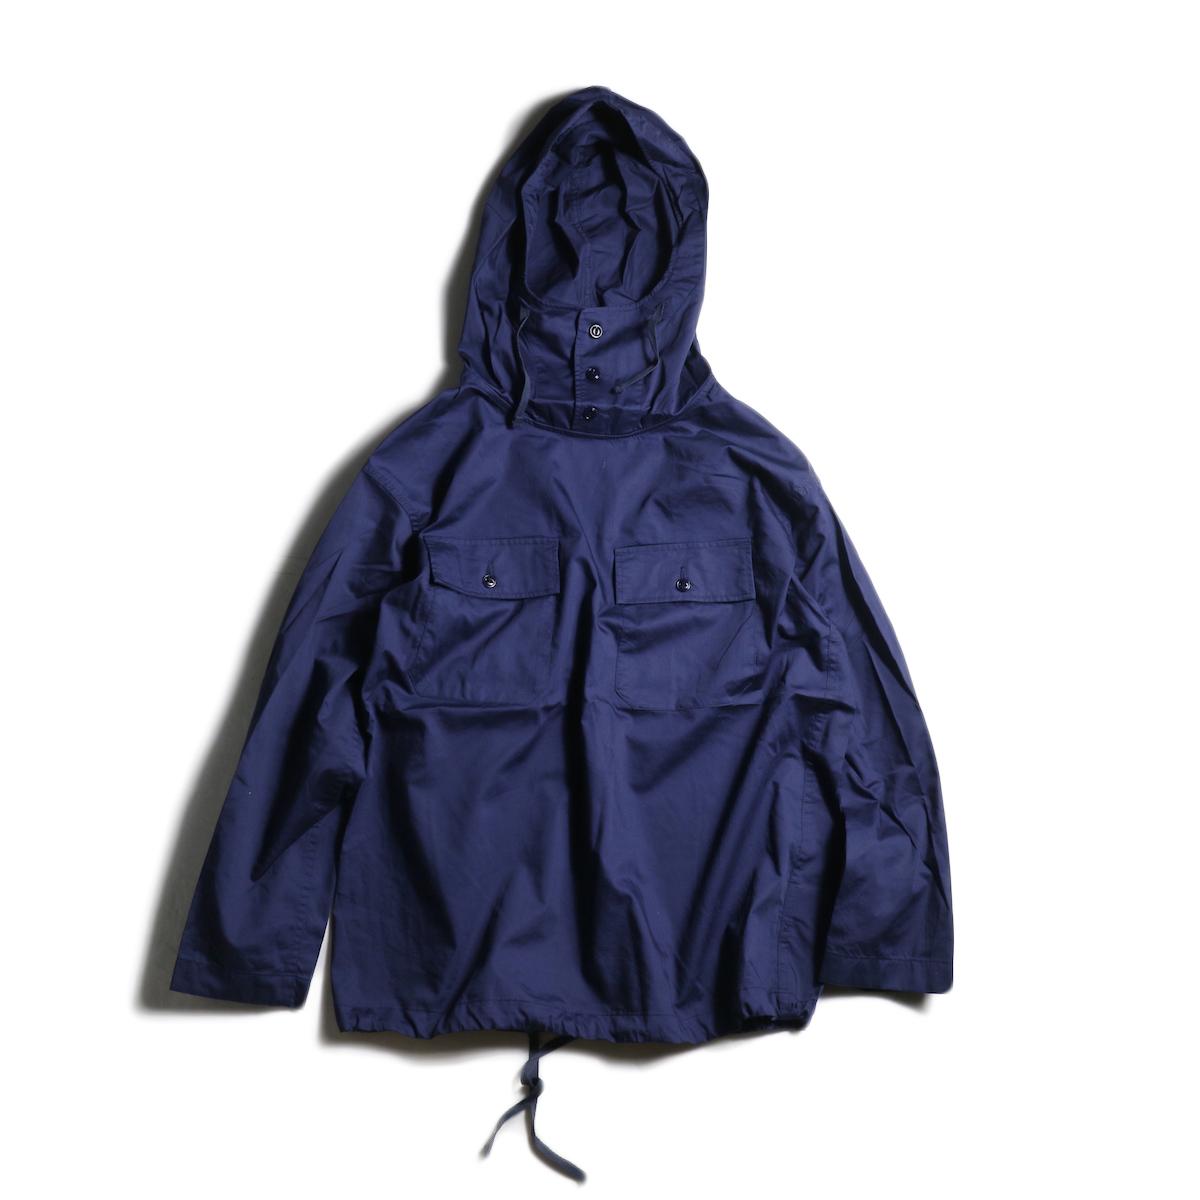 Engineered Garments / Cagoule Shirt -Cotton Nano Twill (Navy)